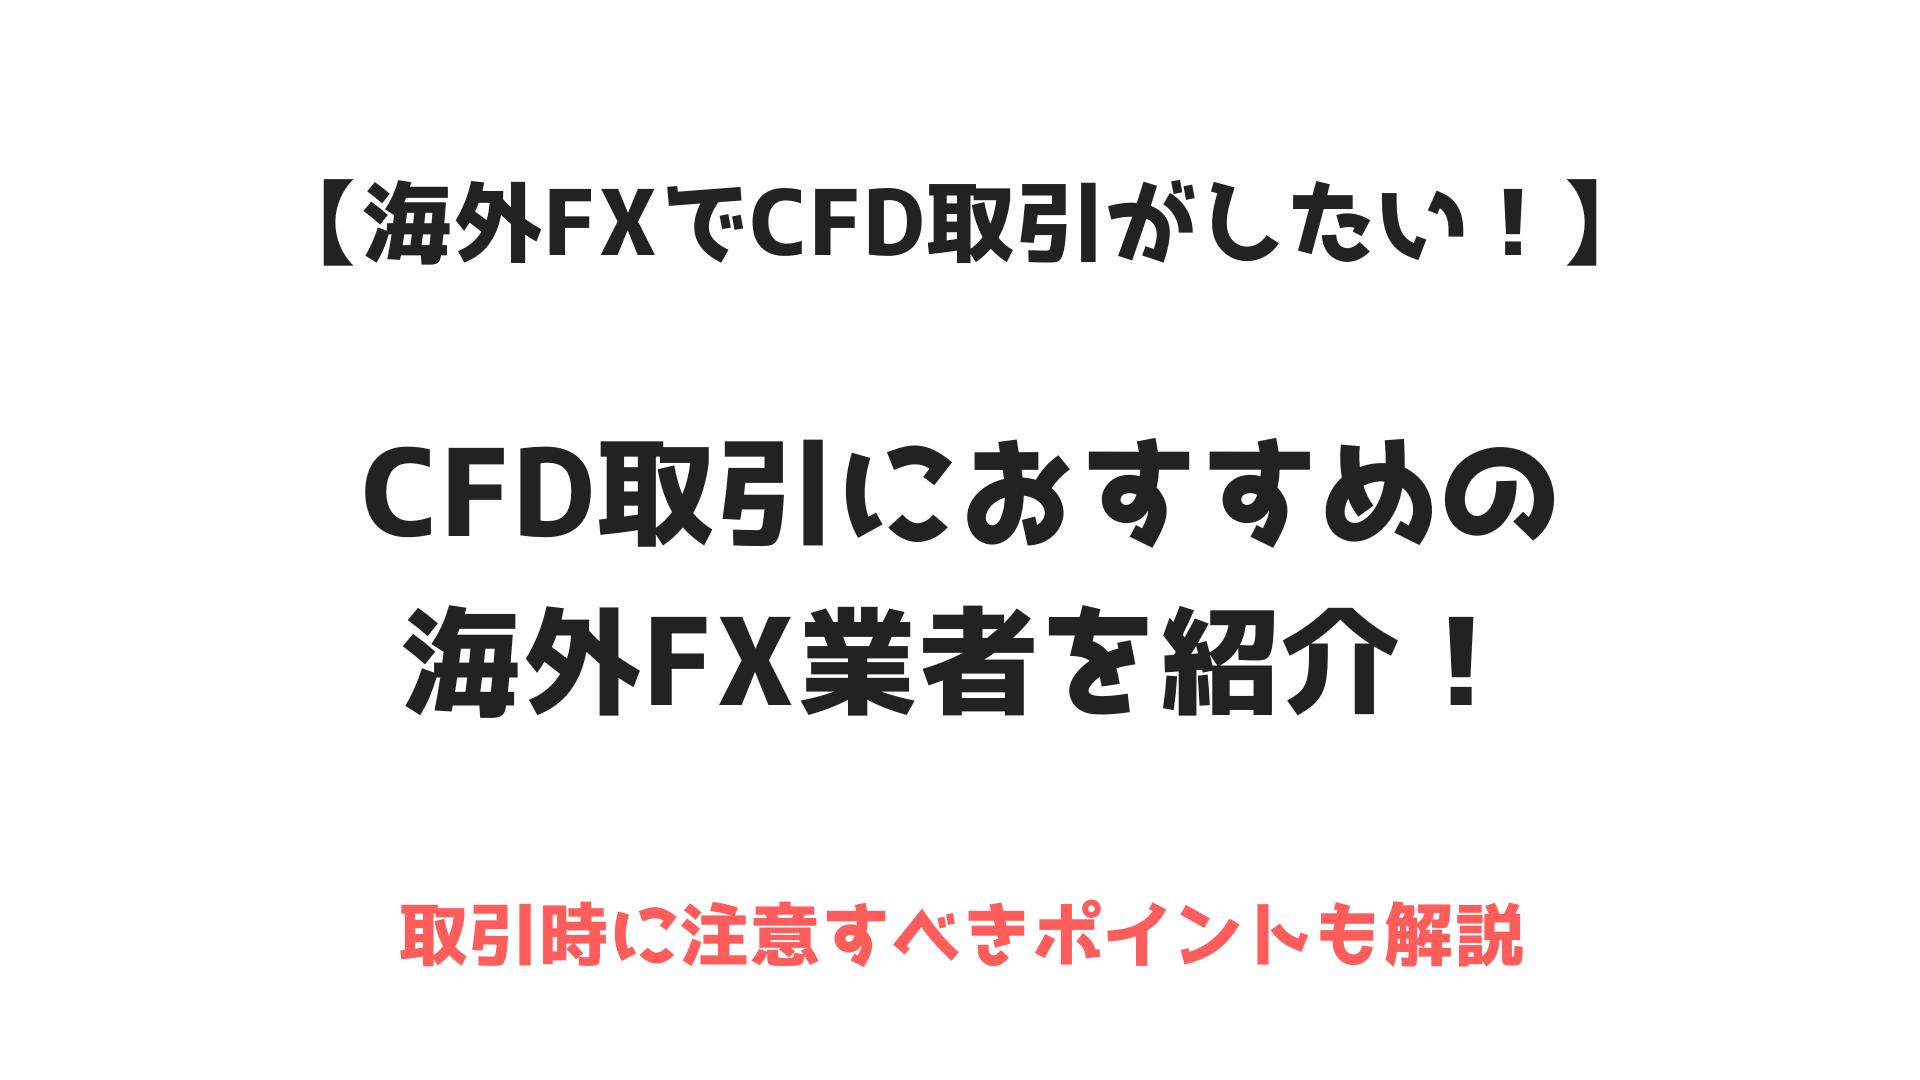 CFD取引ができるおすすめ海外FX業者を紹介